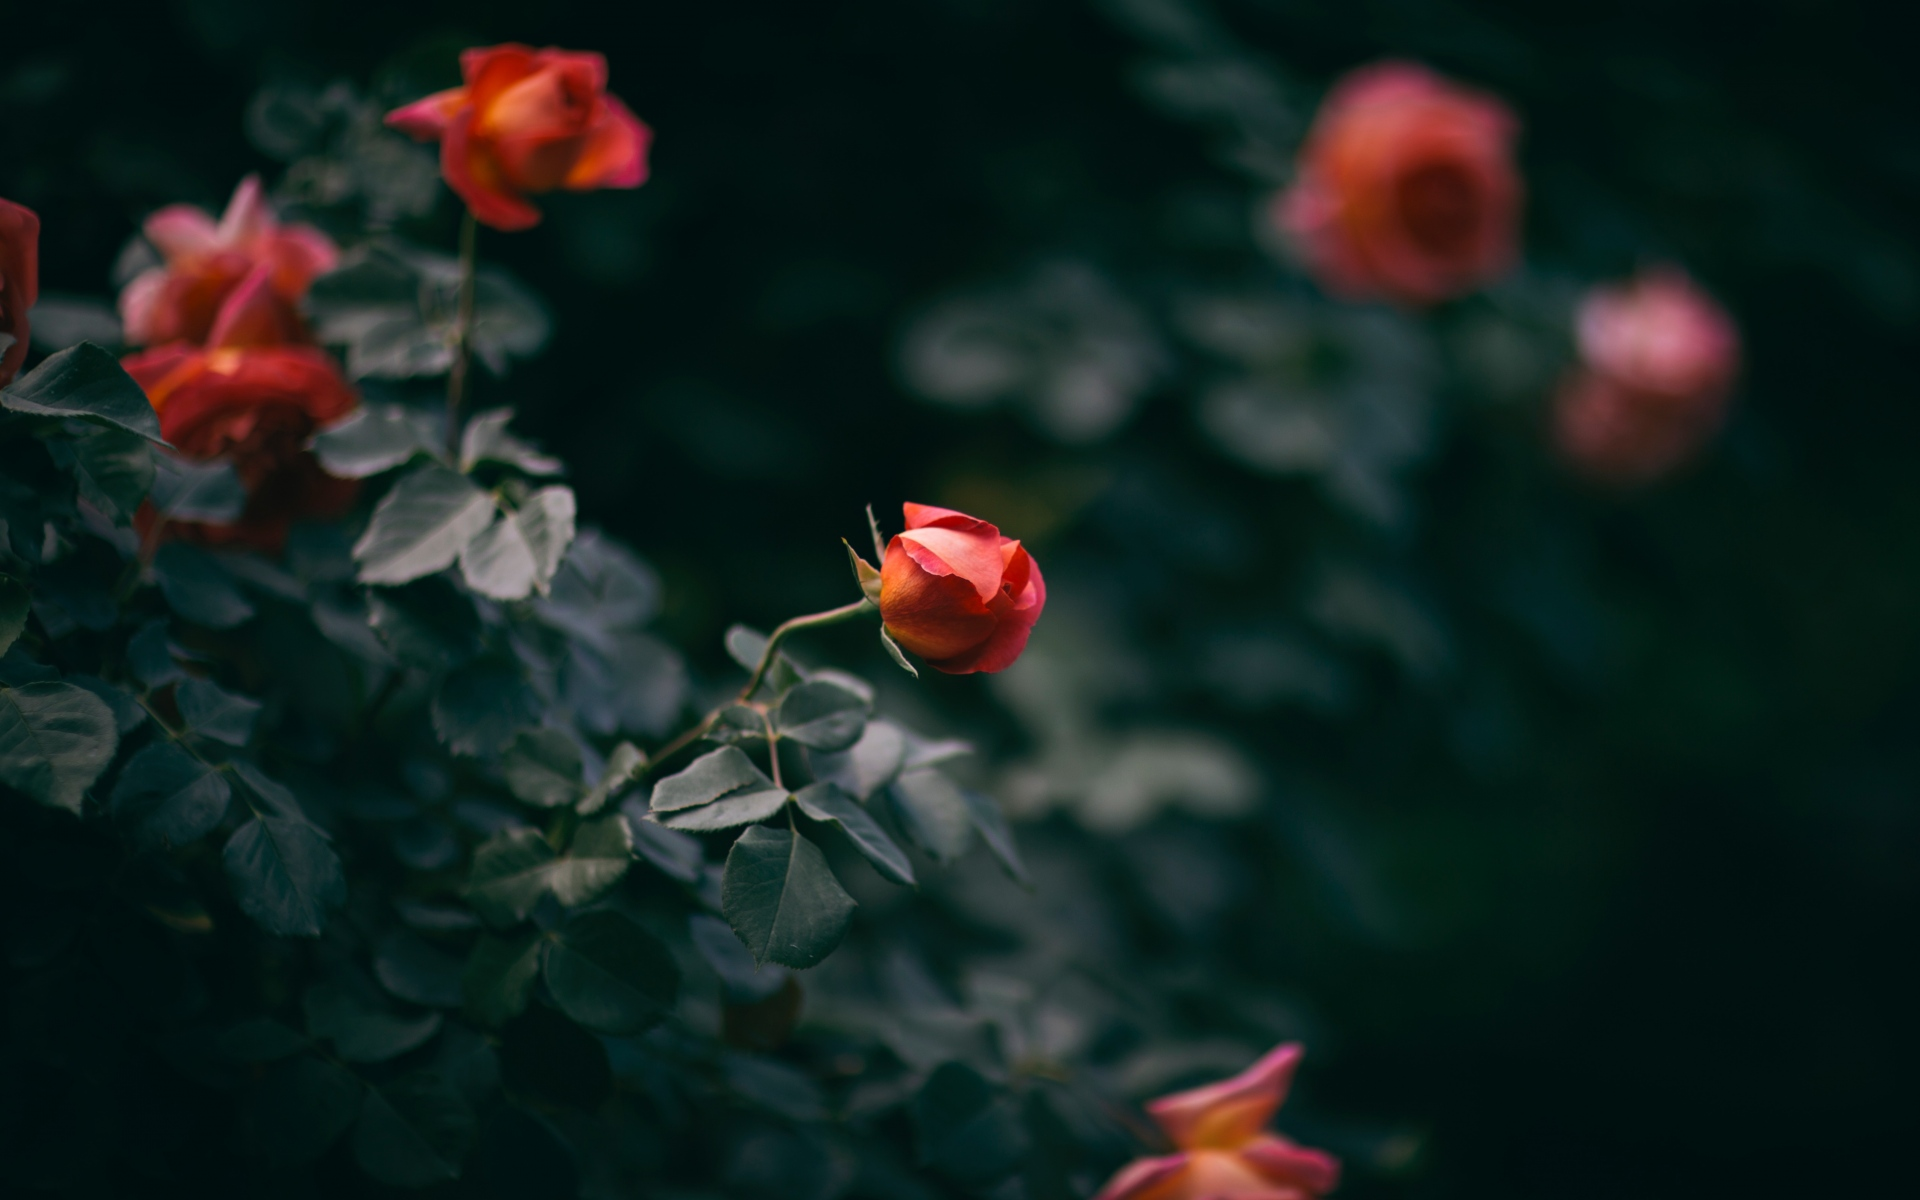 Картинки Роза, цветок, куст, бутоны фото и обои на рабочий стол